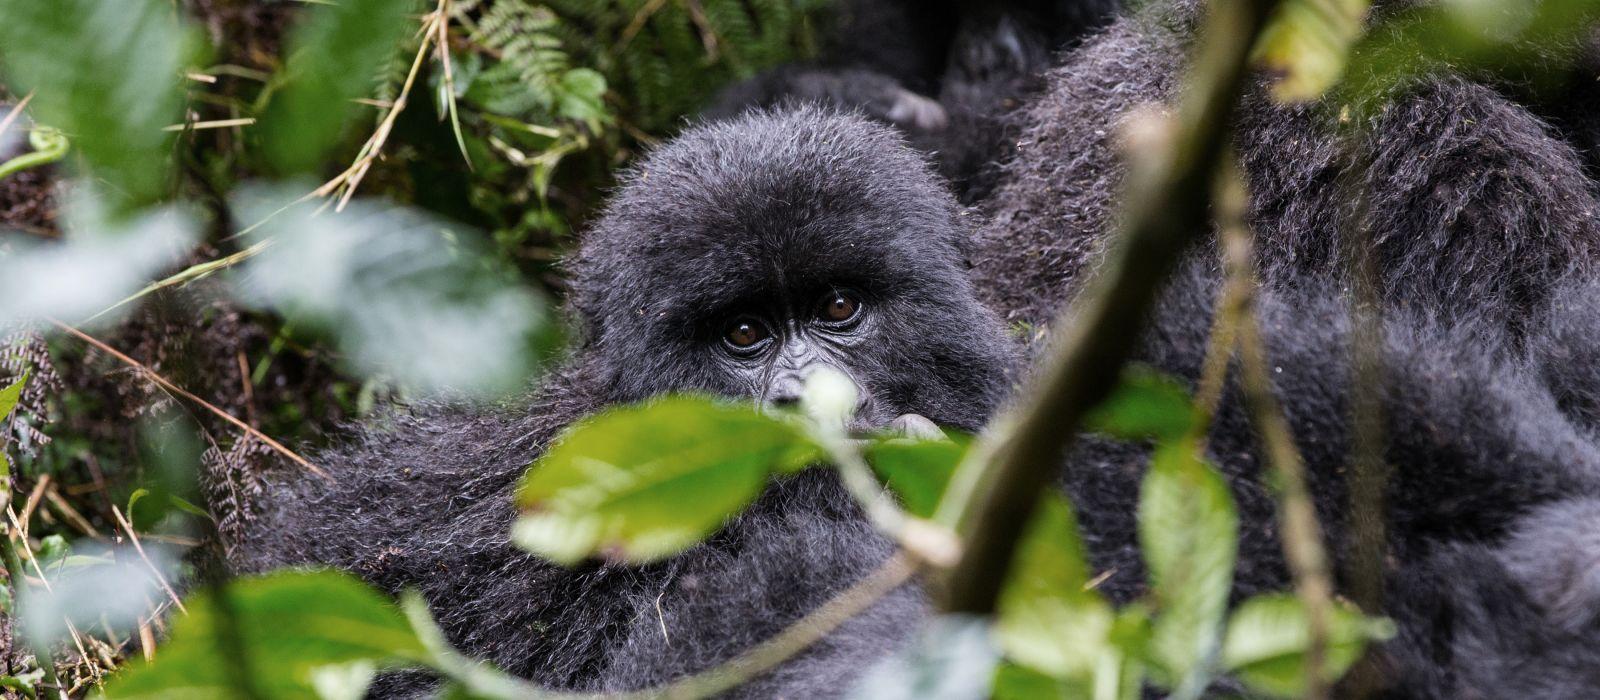 Baby Gorilla in Volcanoes National Park, Rwanda, Africa